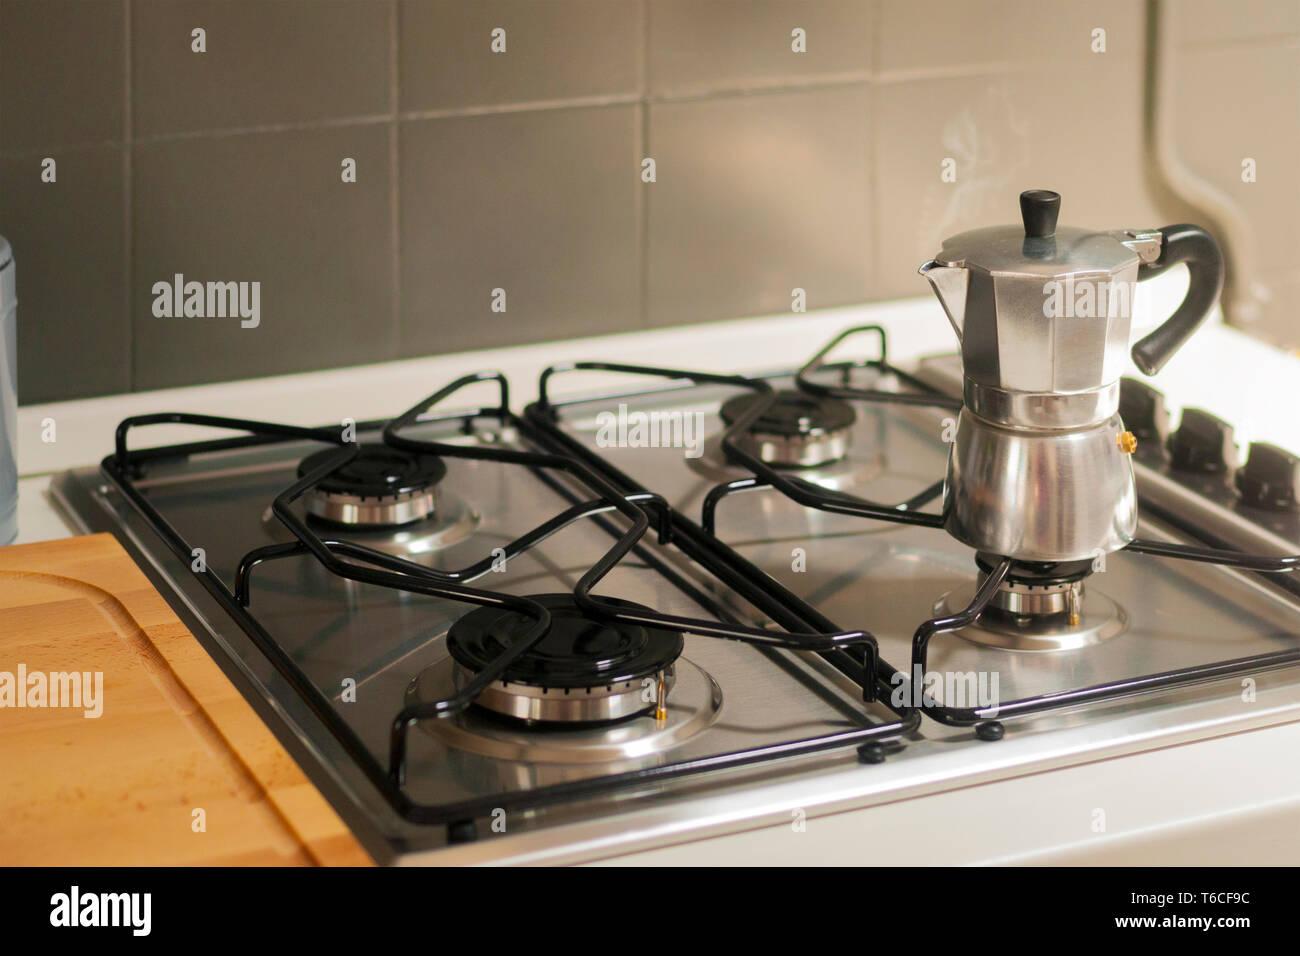 A steaming moka pot on the kitchen stove - Stock Image